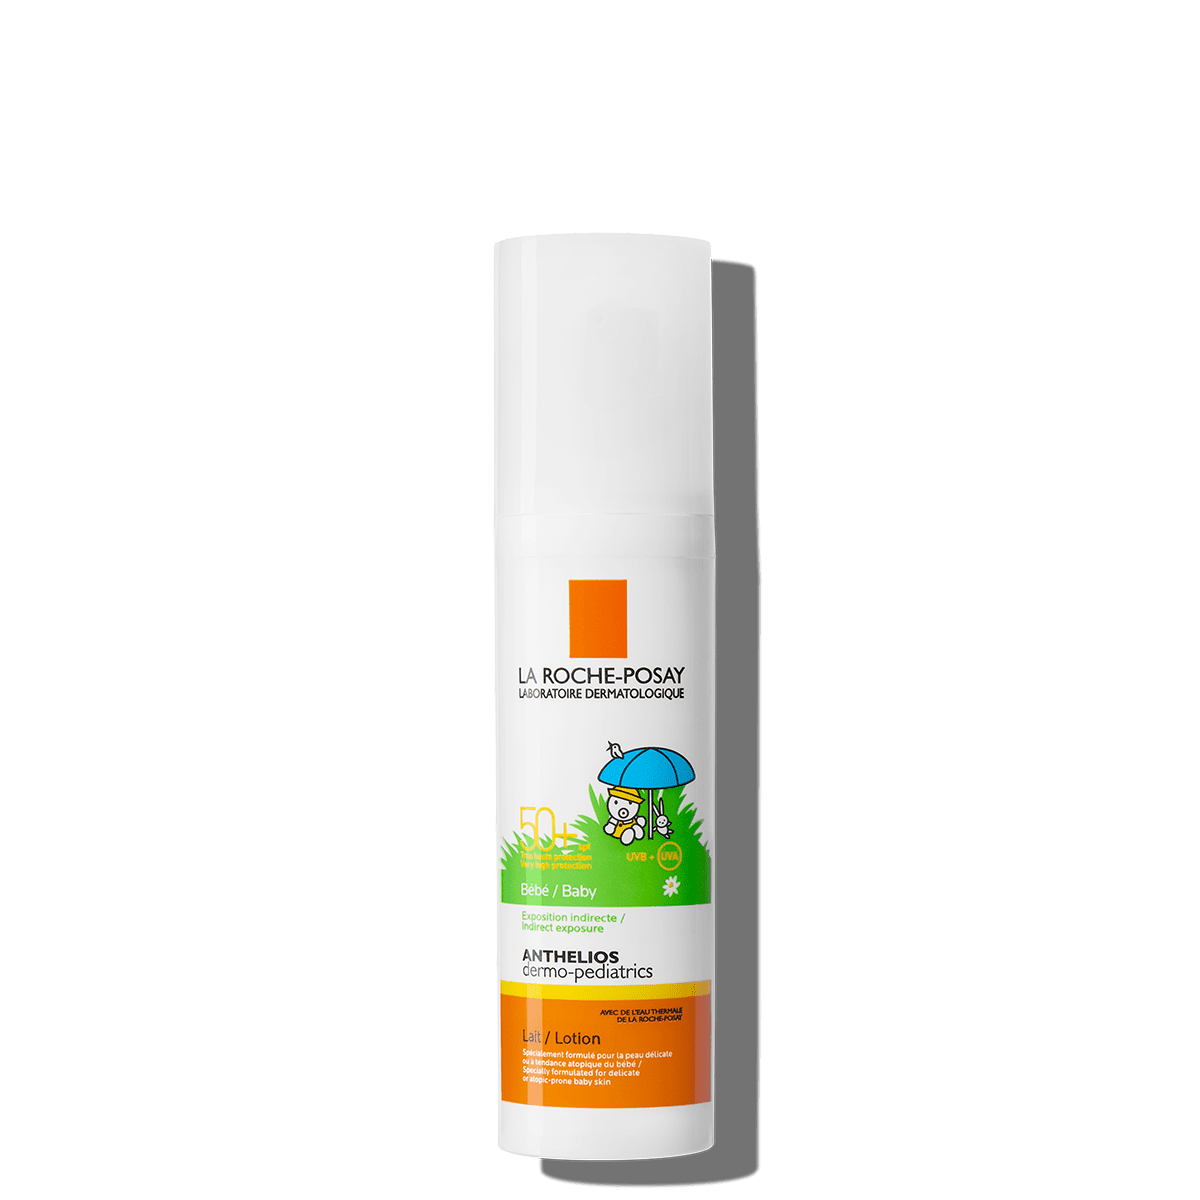 La Roche Posay Produktsida Sol Anthelios Dermo Pediatrics Spf50 50ml